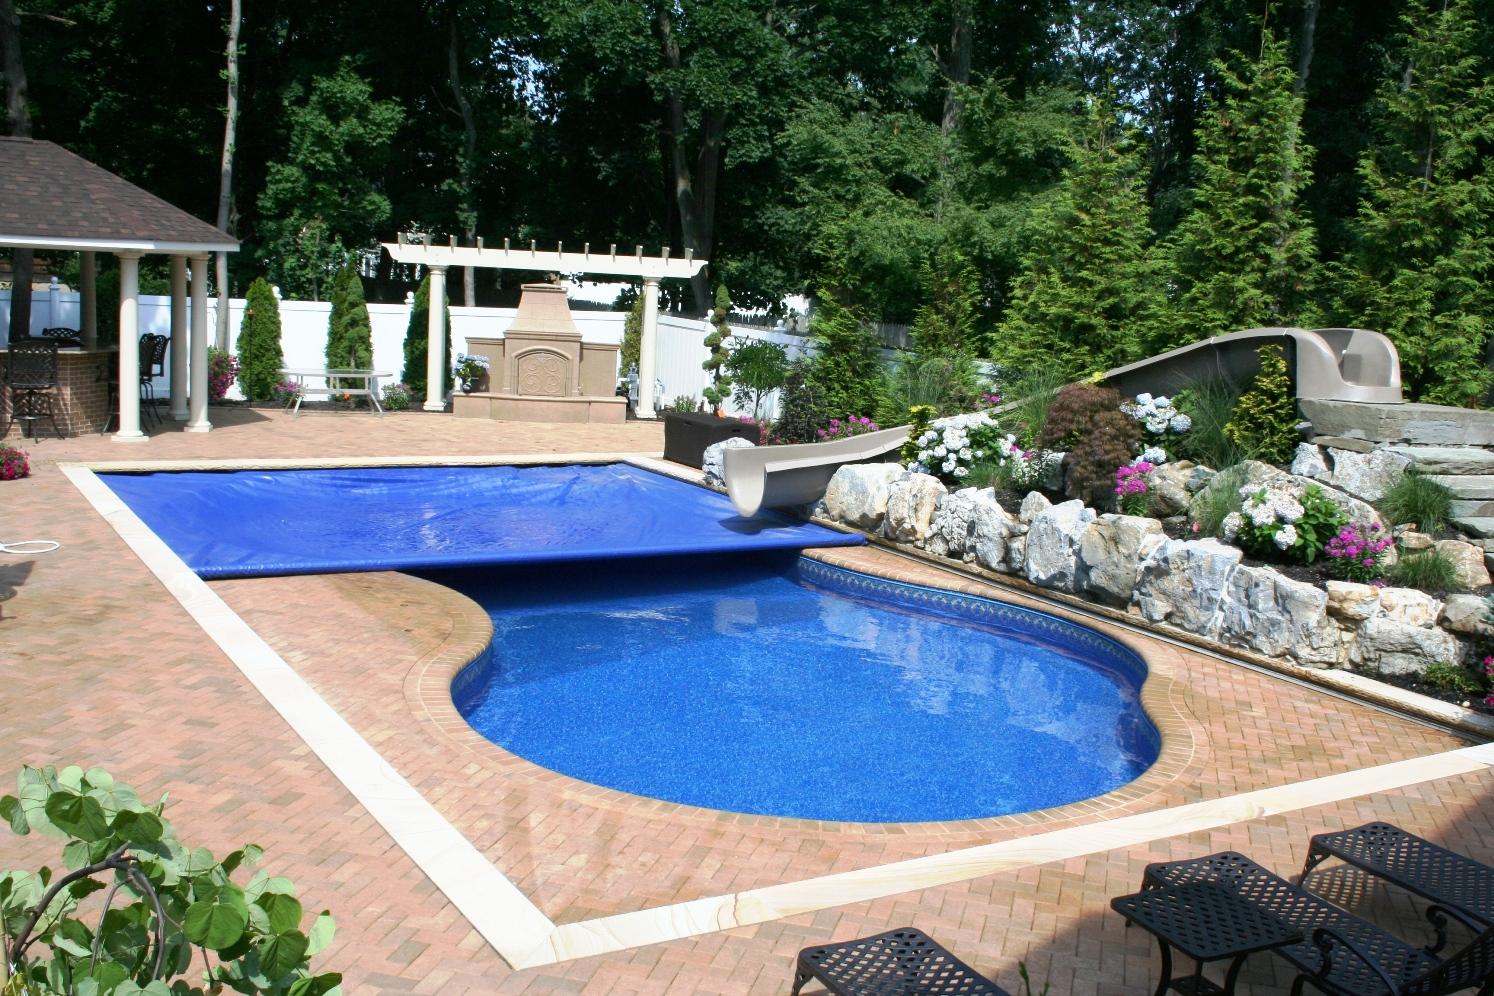 Swimming Pools Gappsi Giuseppe Abbrancati